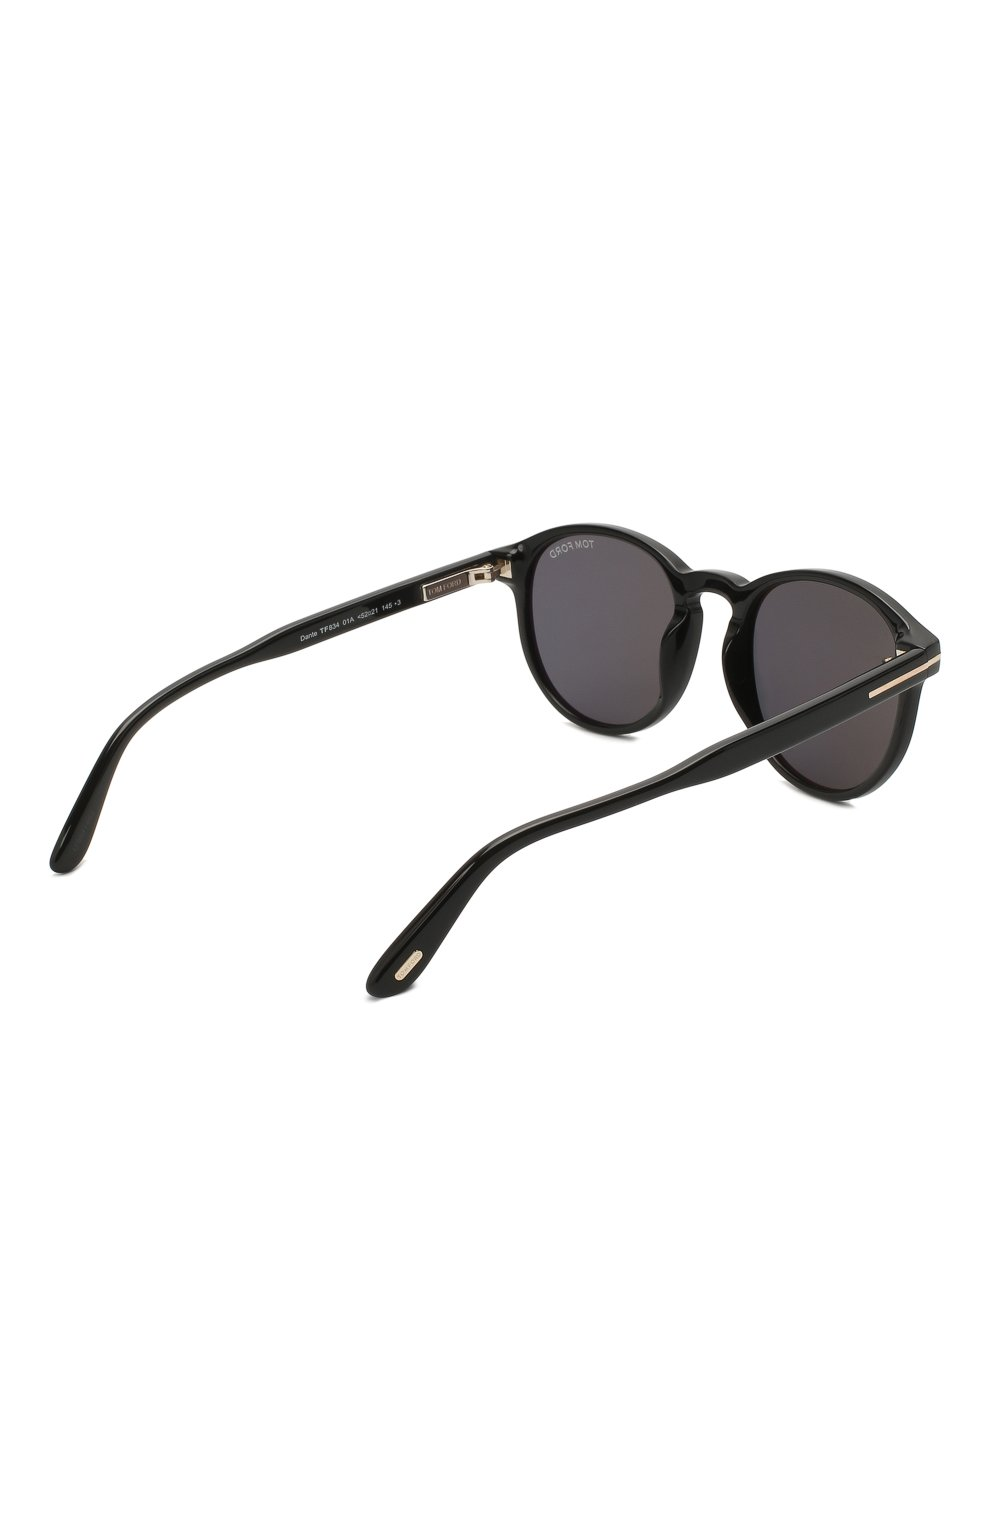 Мужские солнцезащитные очки TOM FORD черного цвета, арт. TF834 01A | Фото 4